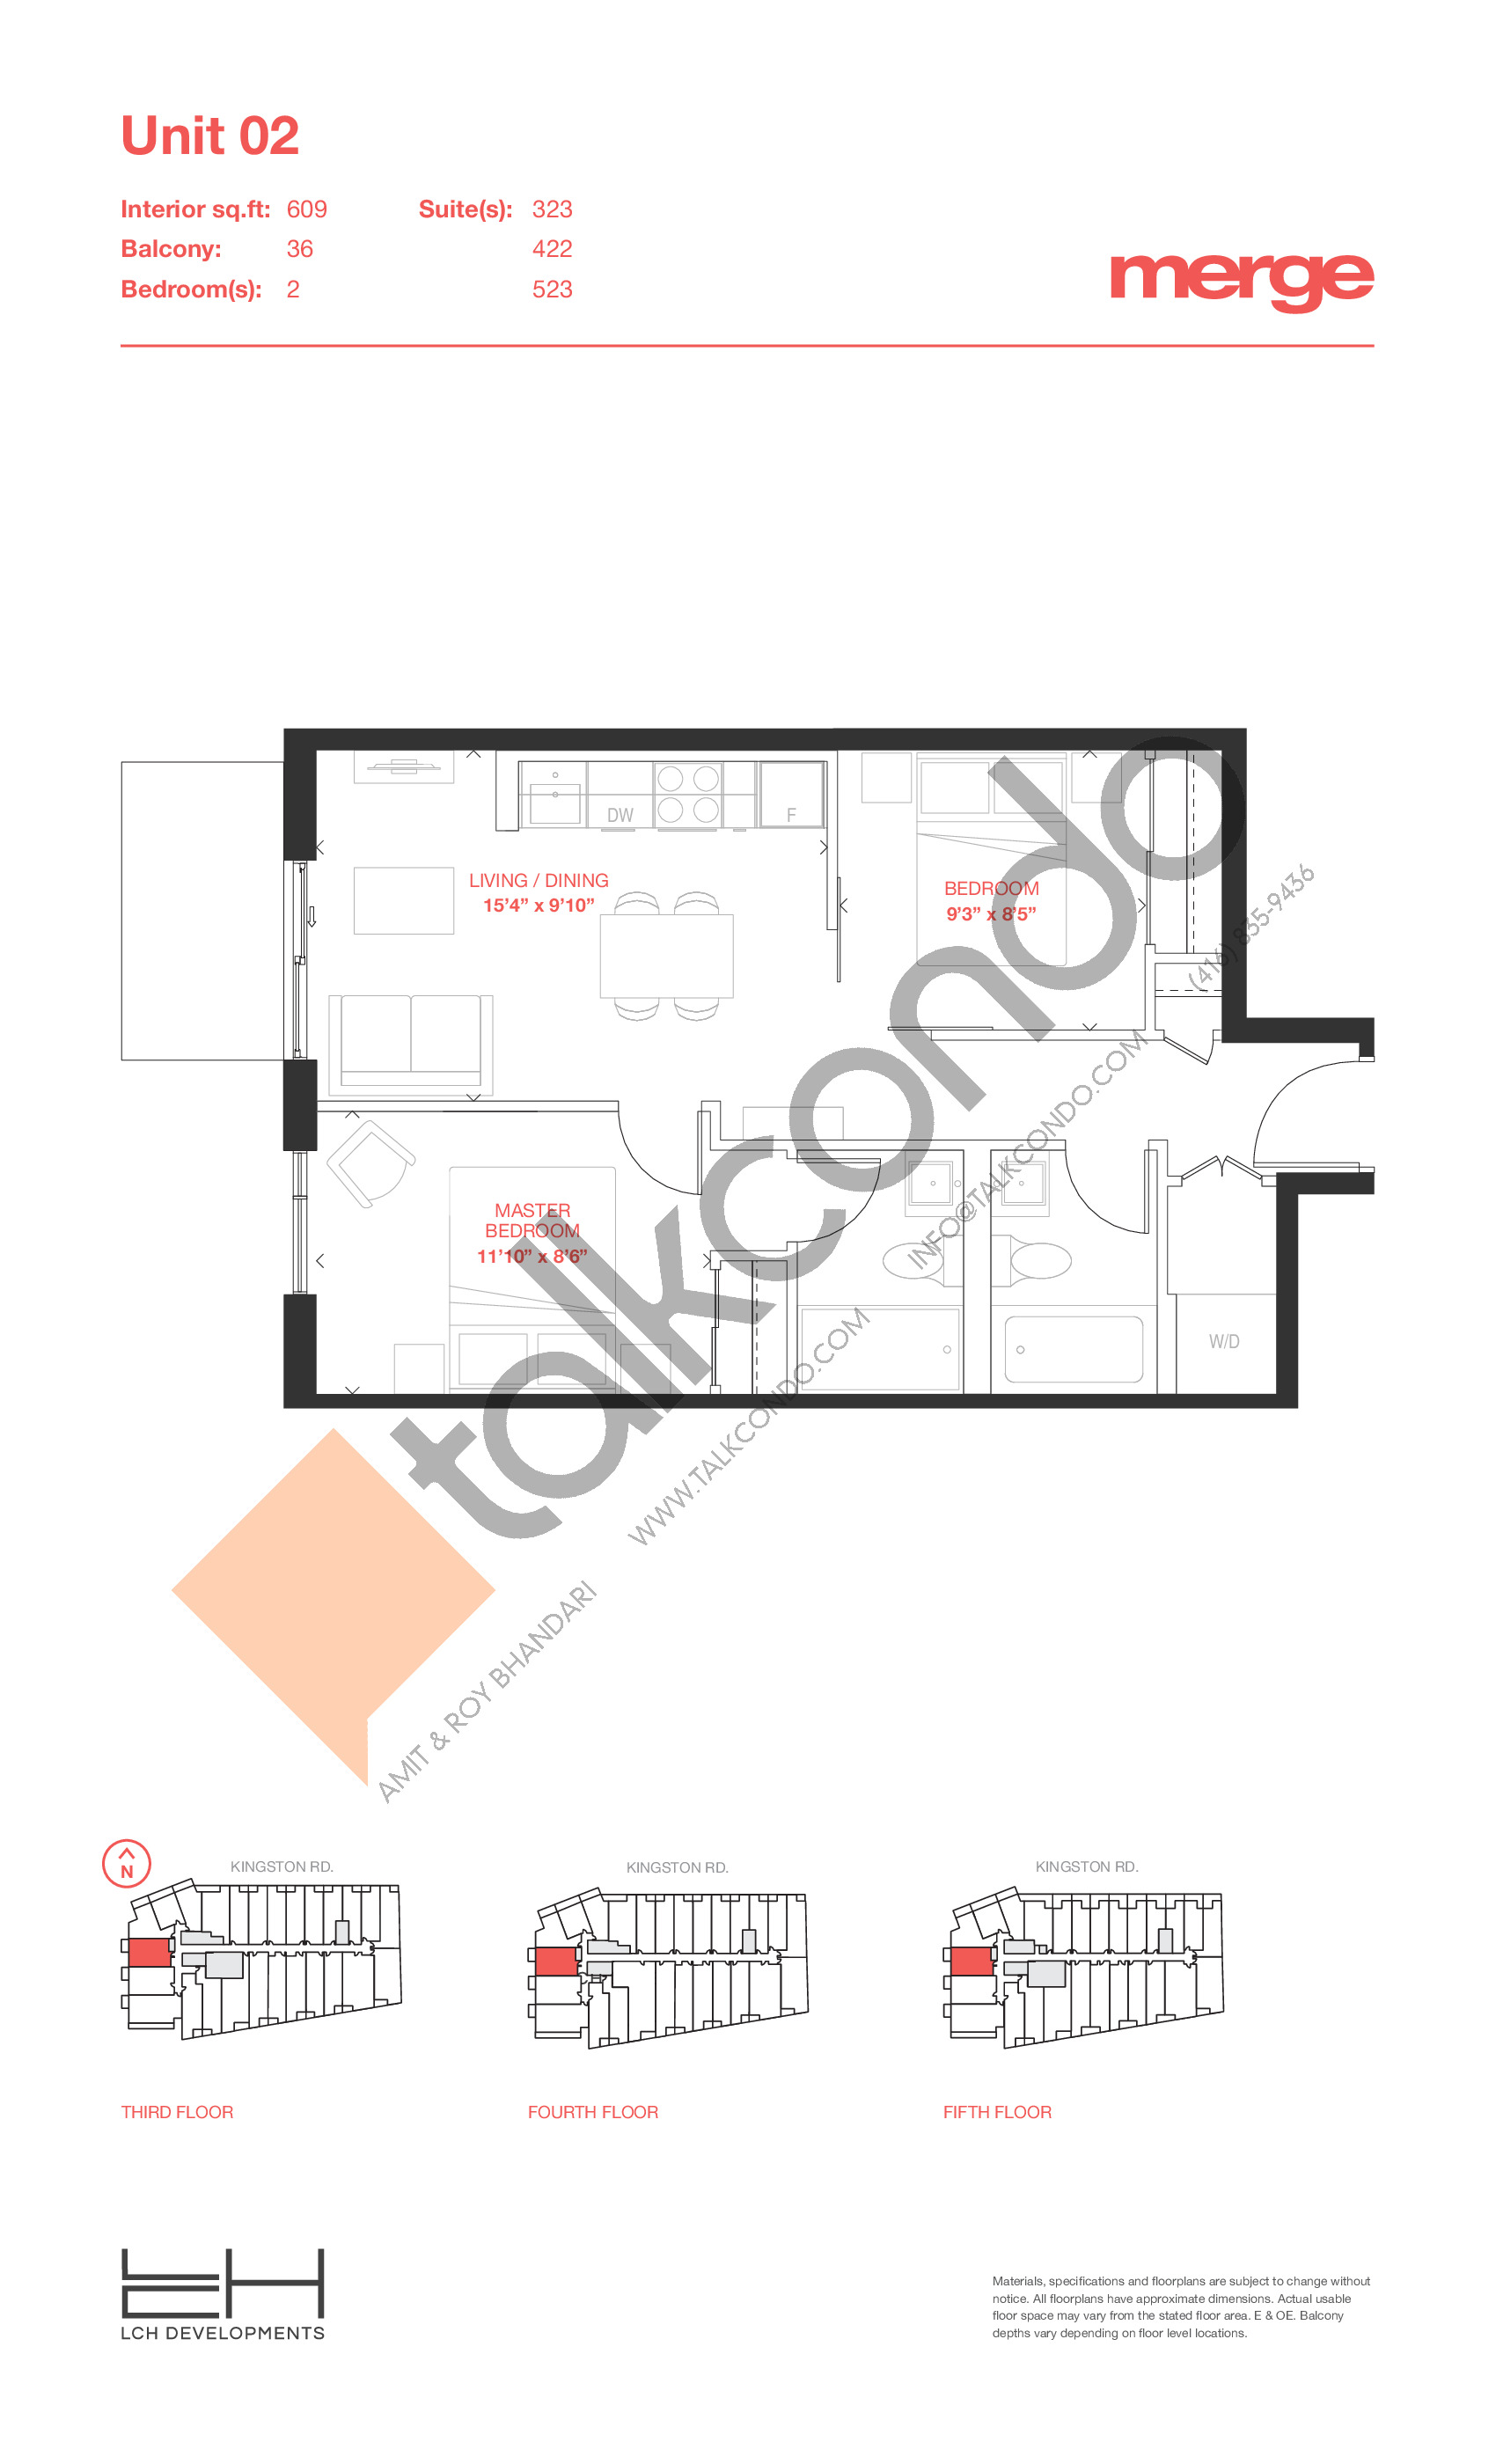 Unit 02 - Tower Floor Plan at Merge Condos - 609 sq.ft